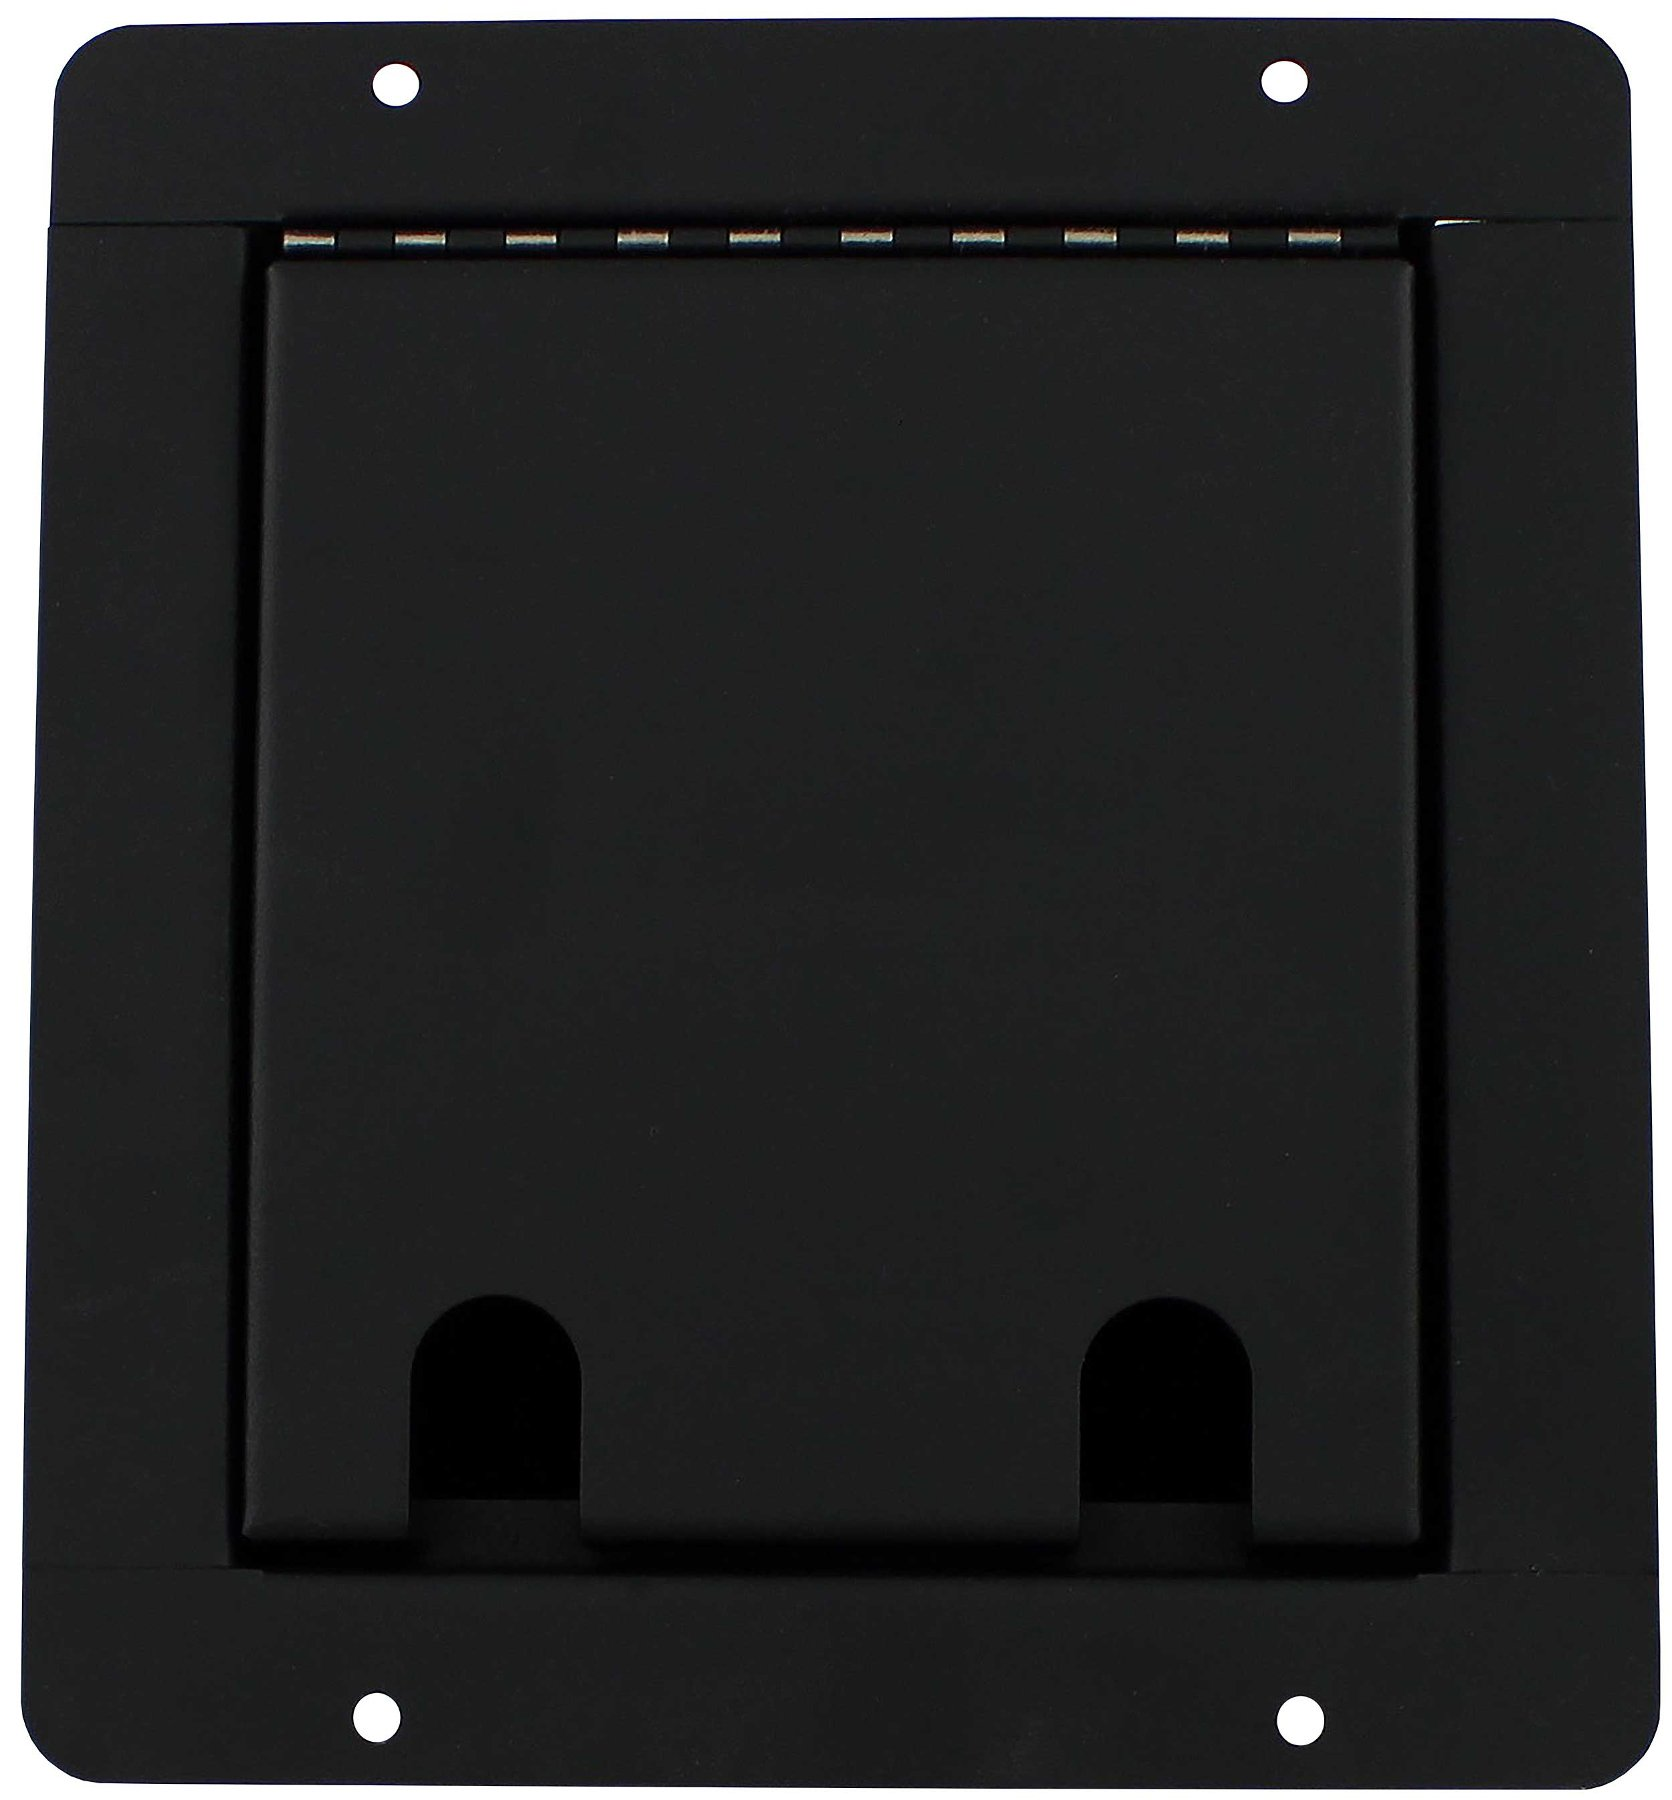 Pro Co Sound Pocket with 4-XLRF Connectors